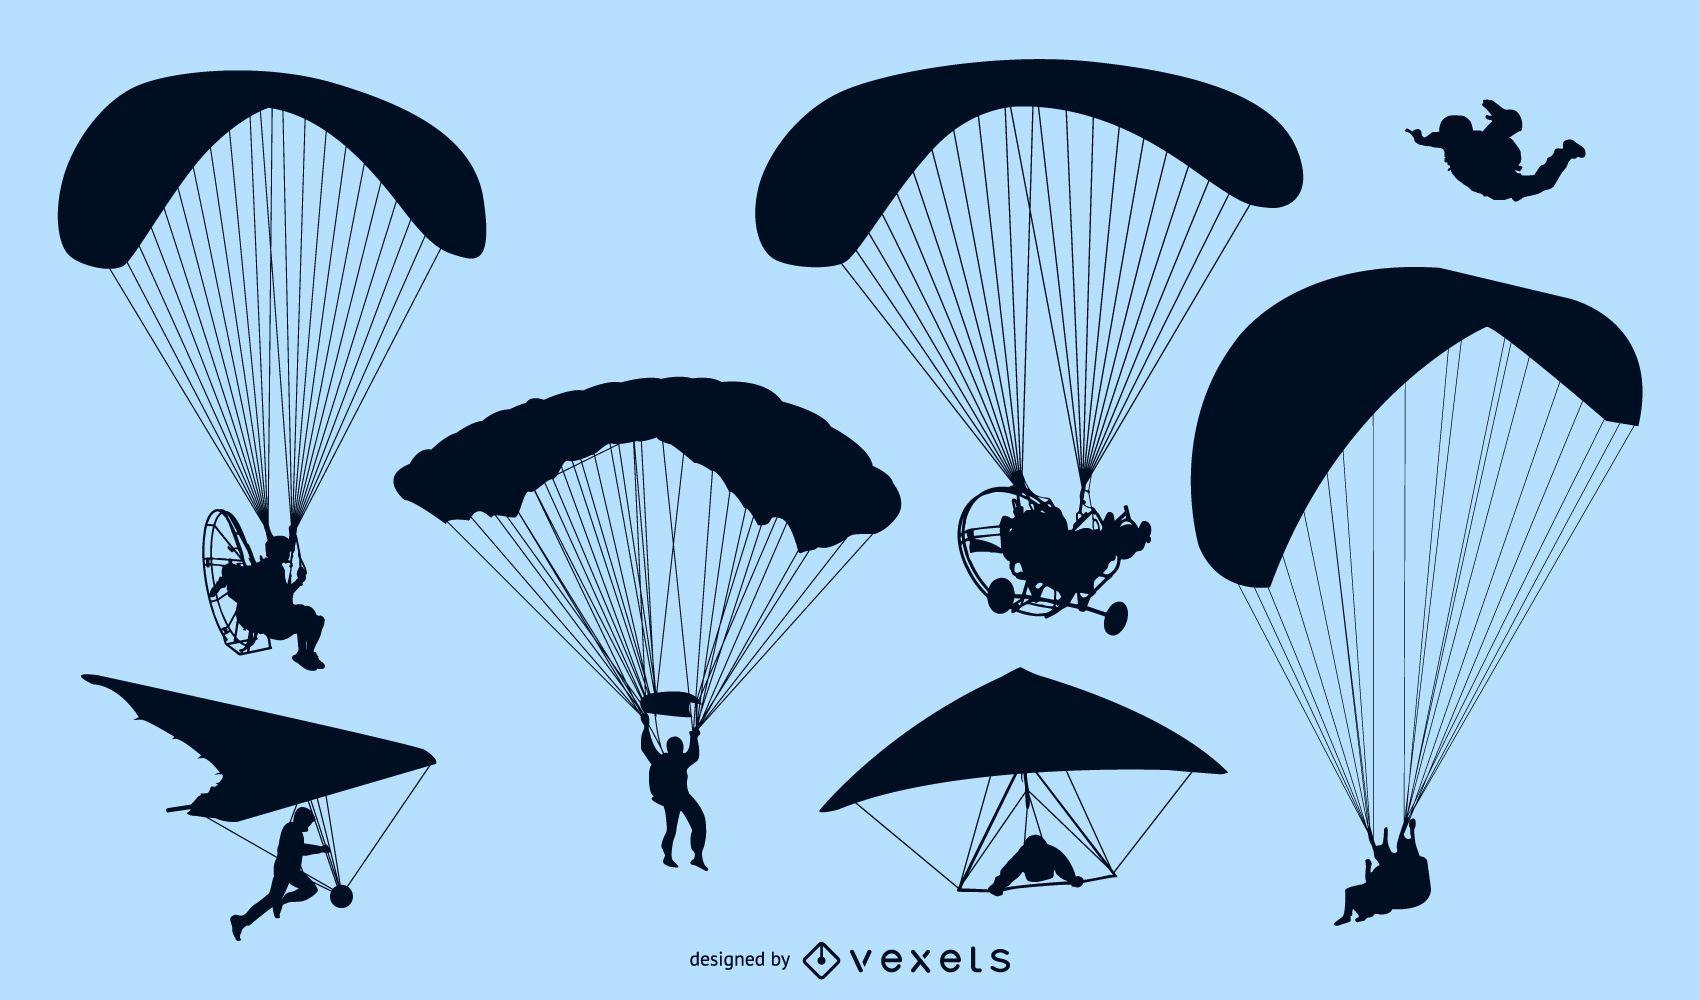 Satz Fallschirm- und Fallschirmspringer-Silhouetten